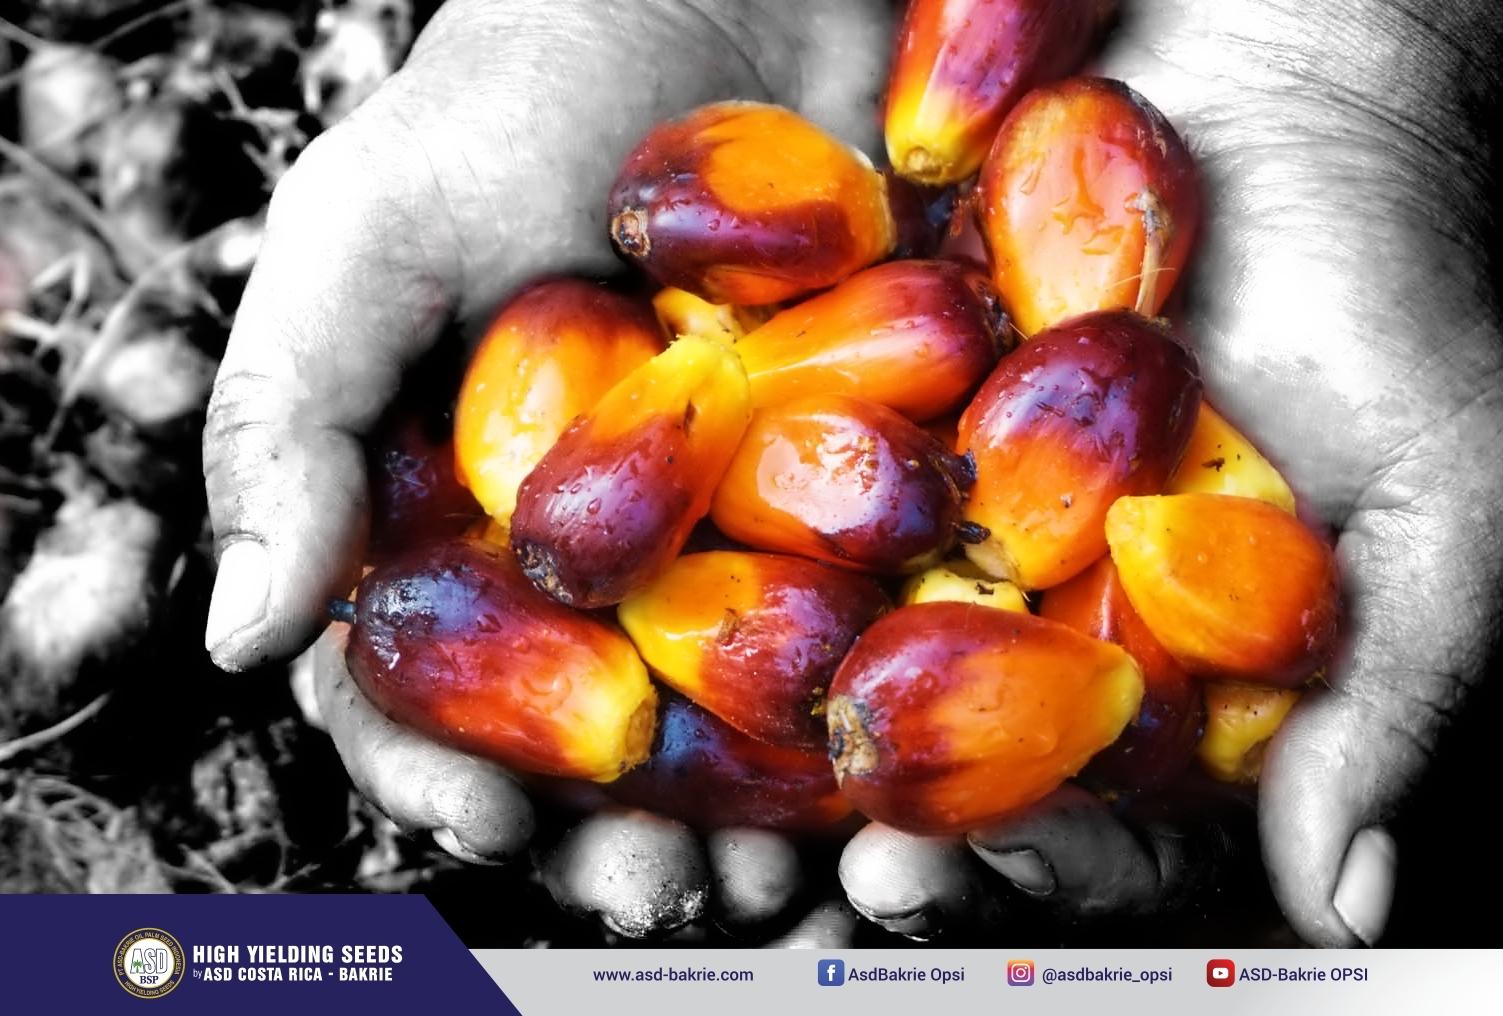 Varietas DxP Spring - produk unggulan PT ASD-Bakrie Oil Palm Seed Indonesia